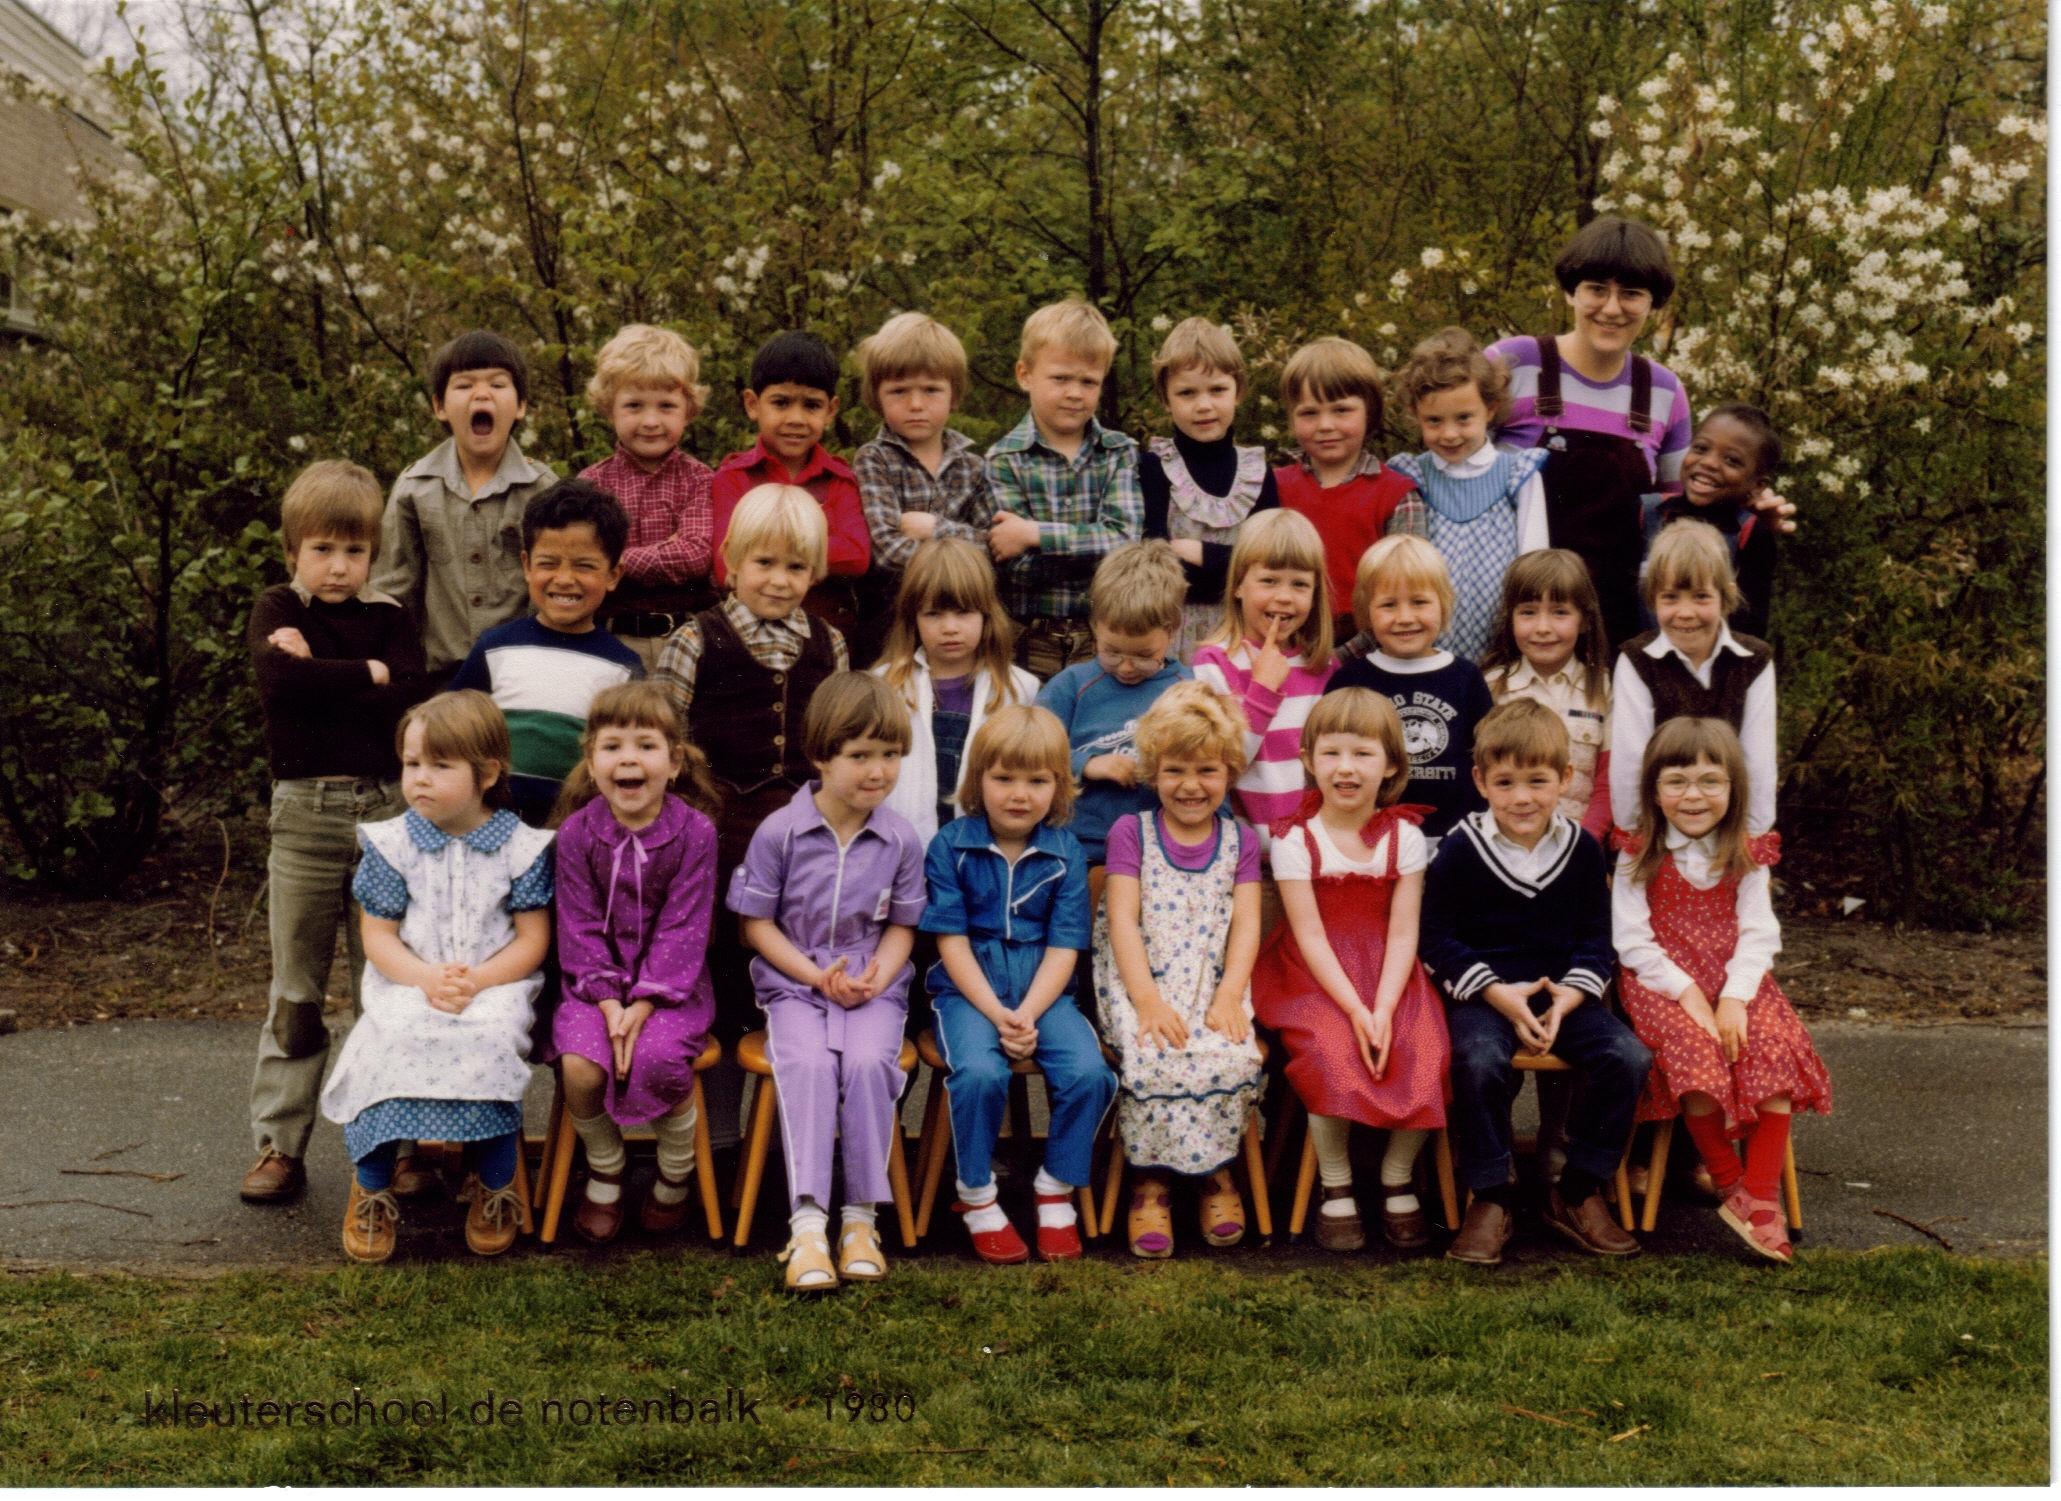 kleuterschool de notenbalk foto